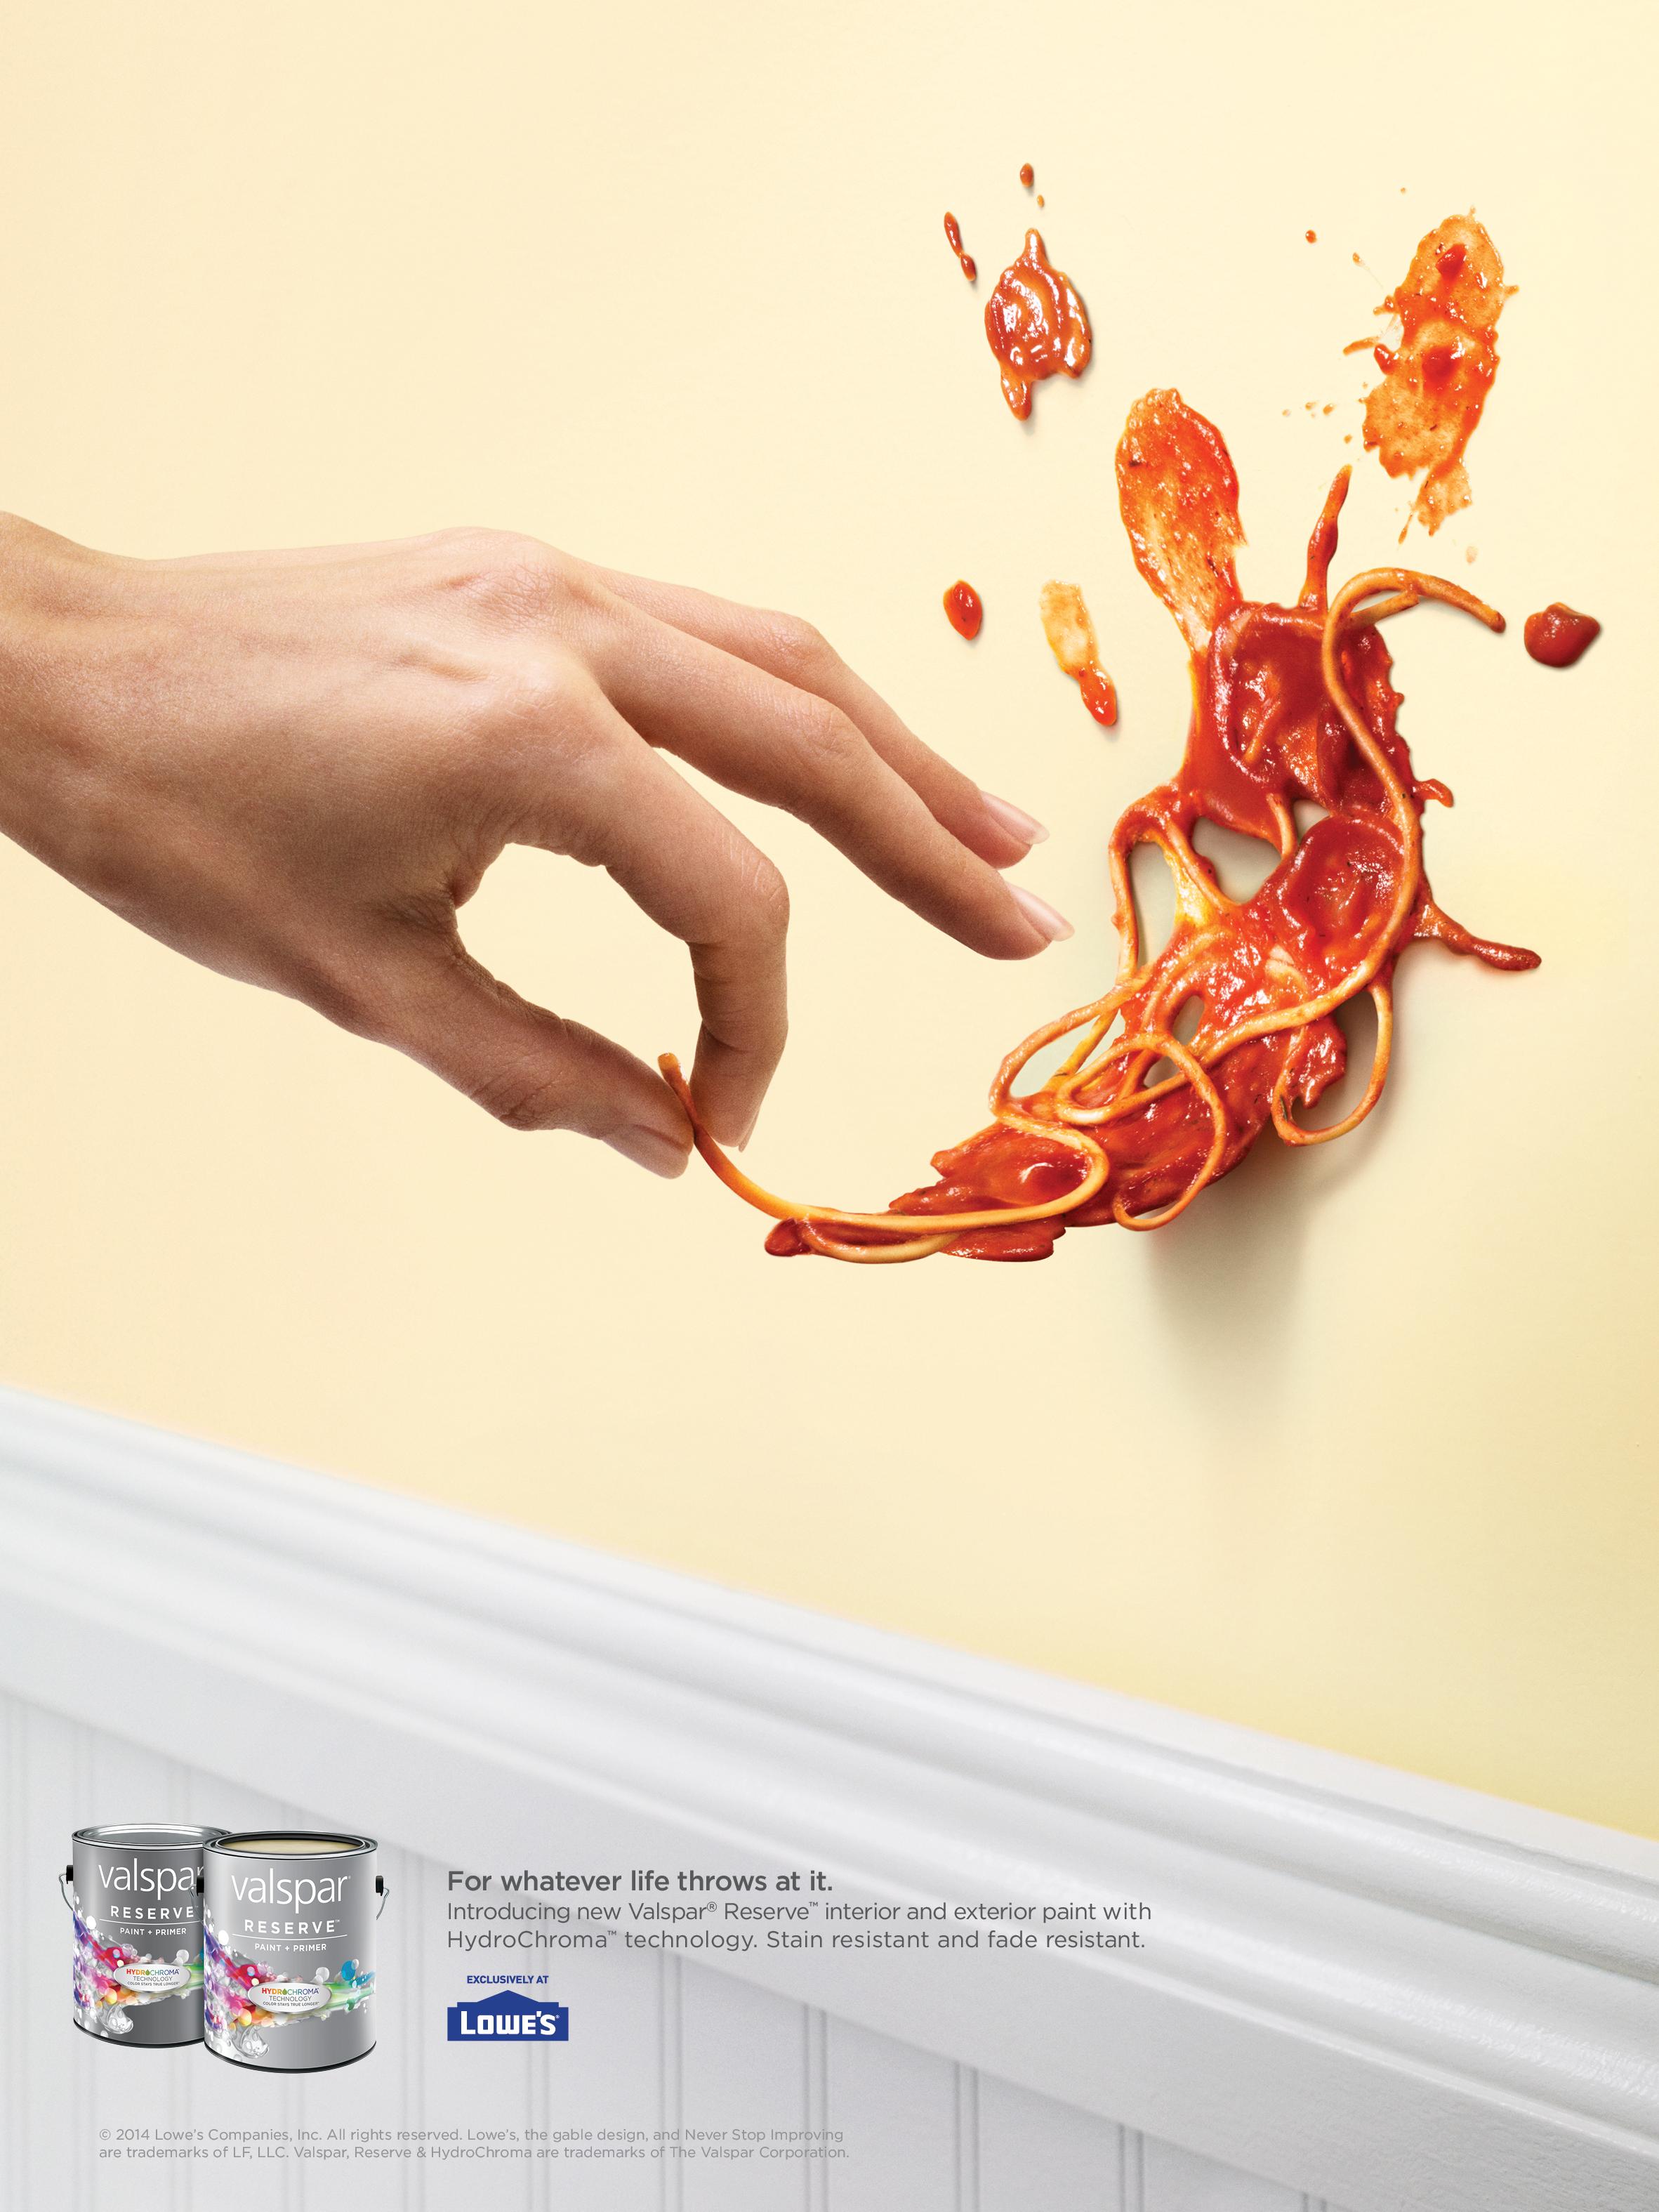 lowes_spaghetti.jpg